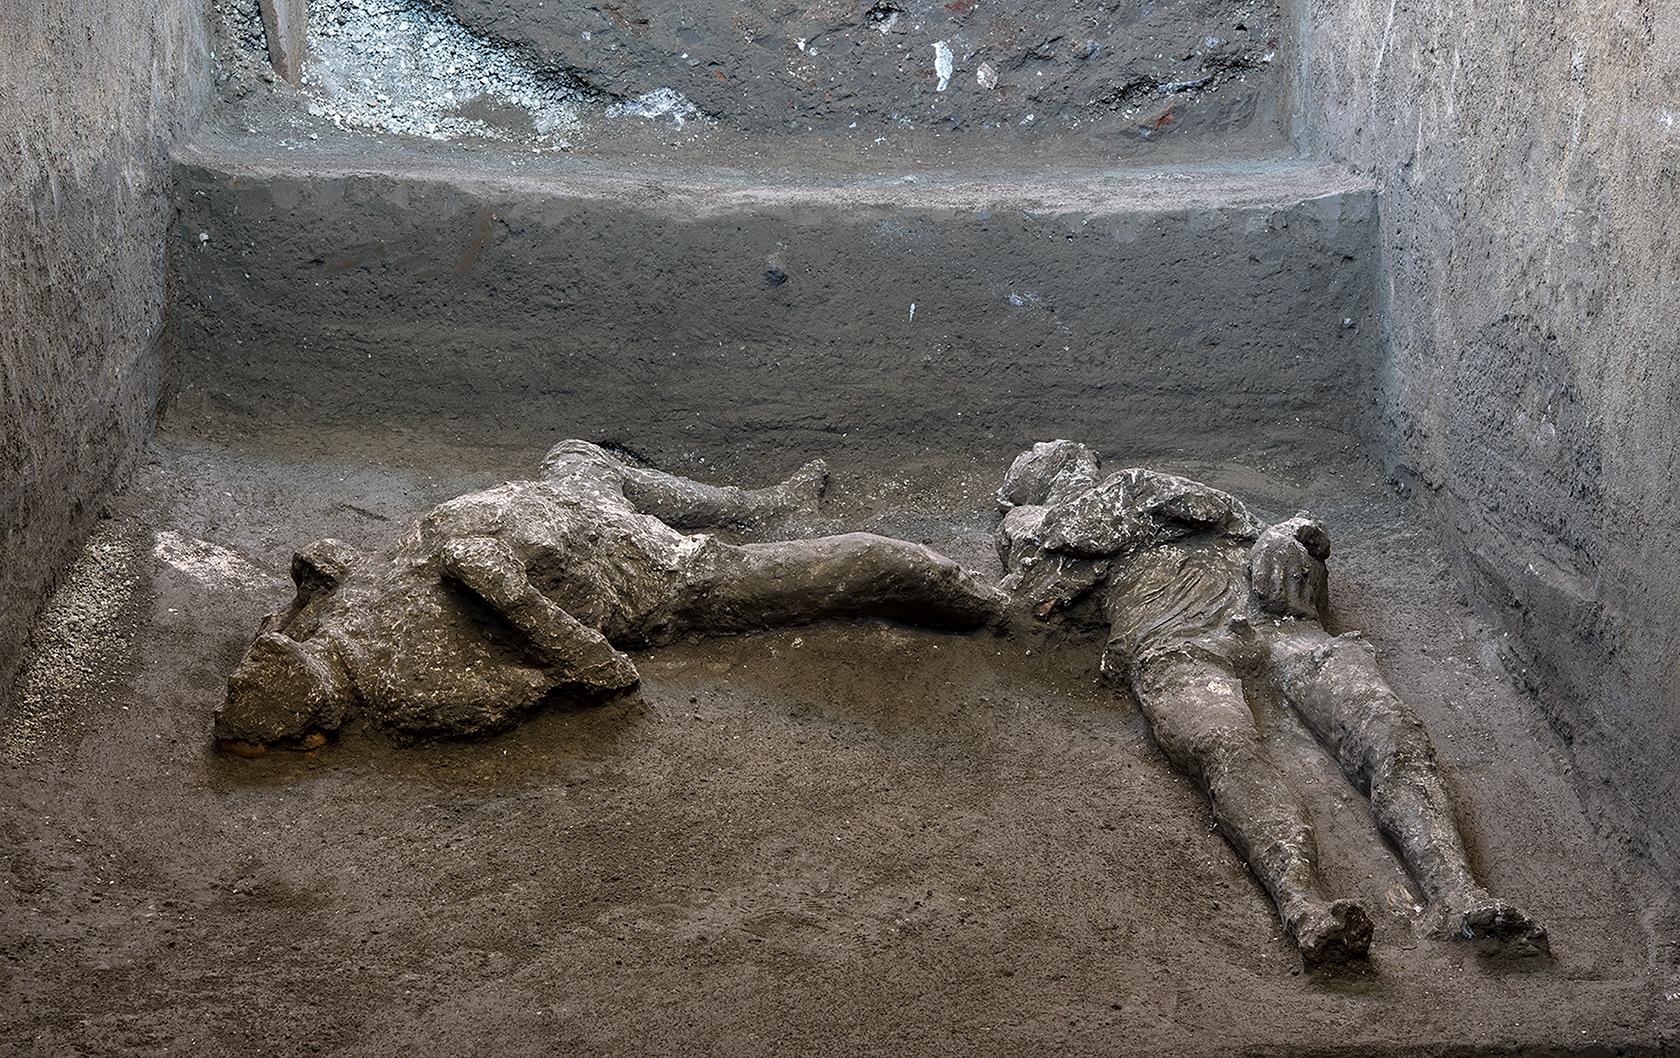 Pompeii plaster casts